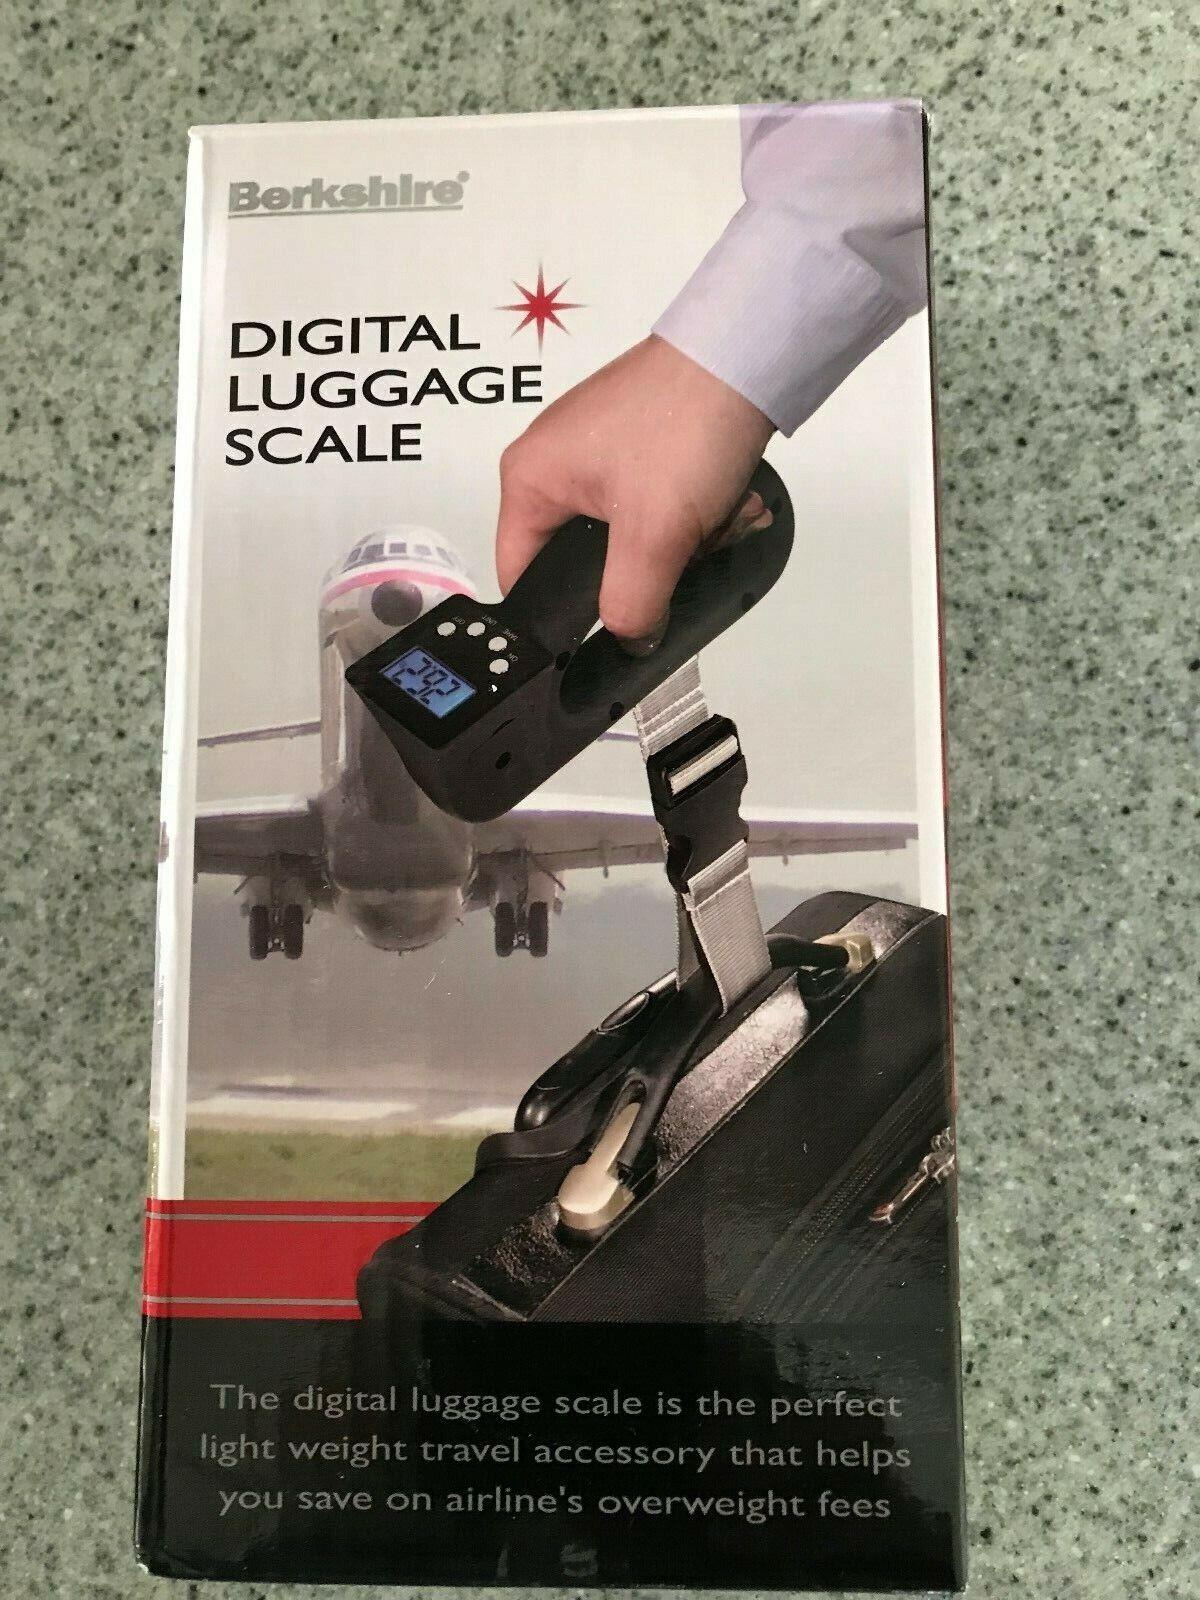 Luggage Scale Digital Berkshire - $20.00